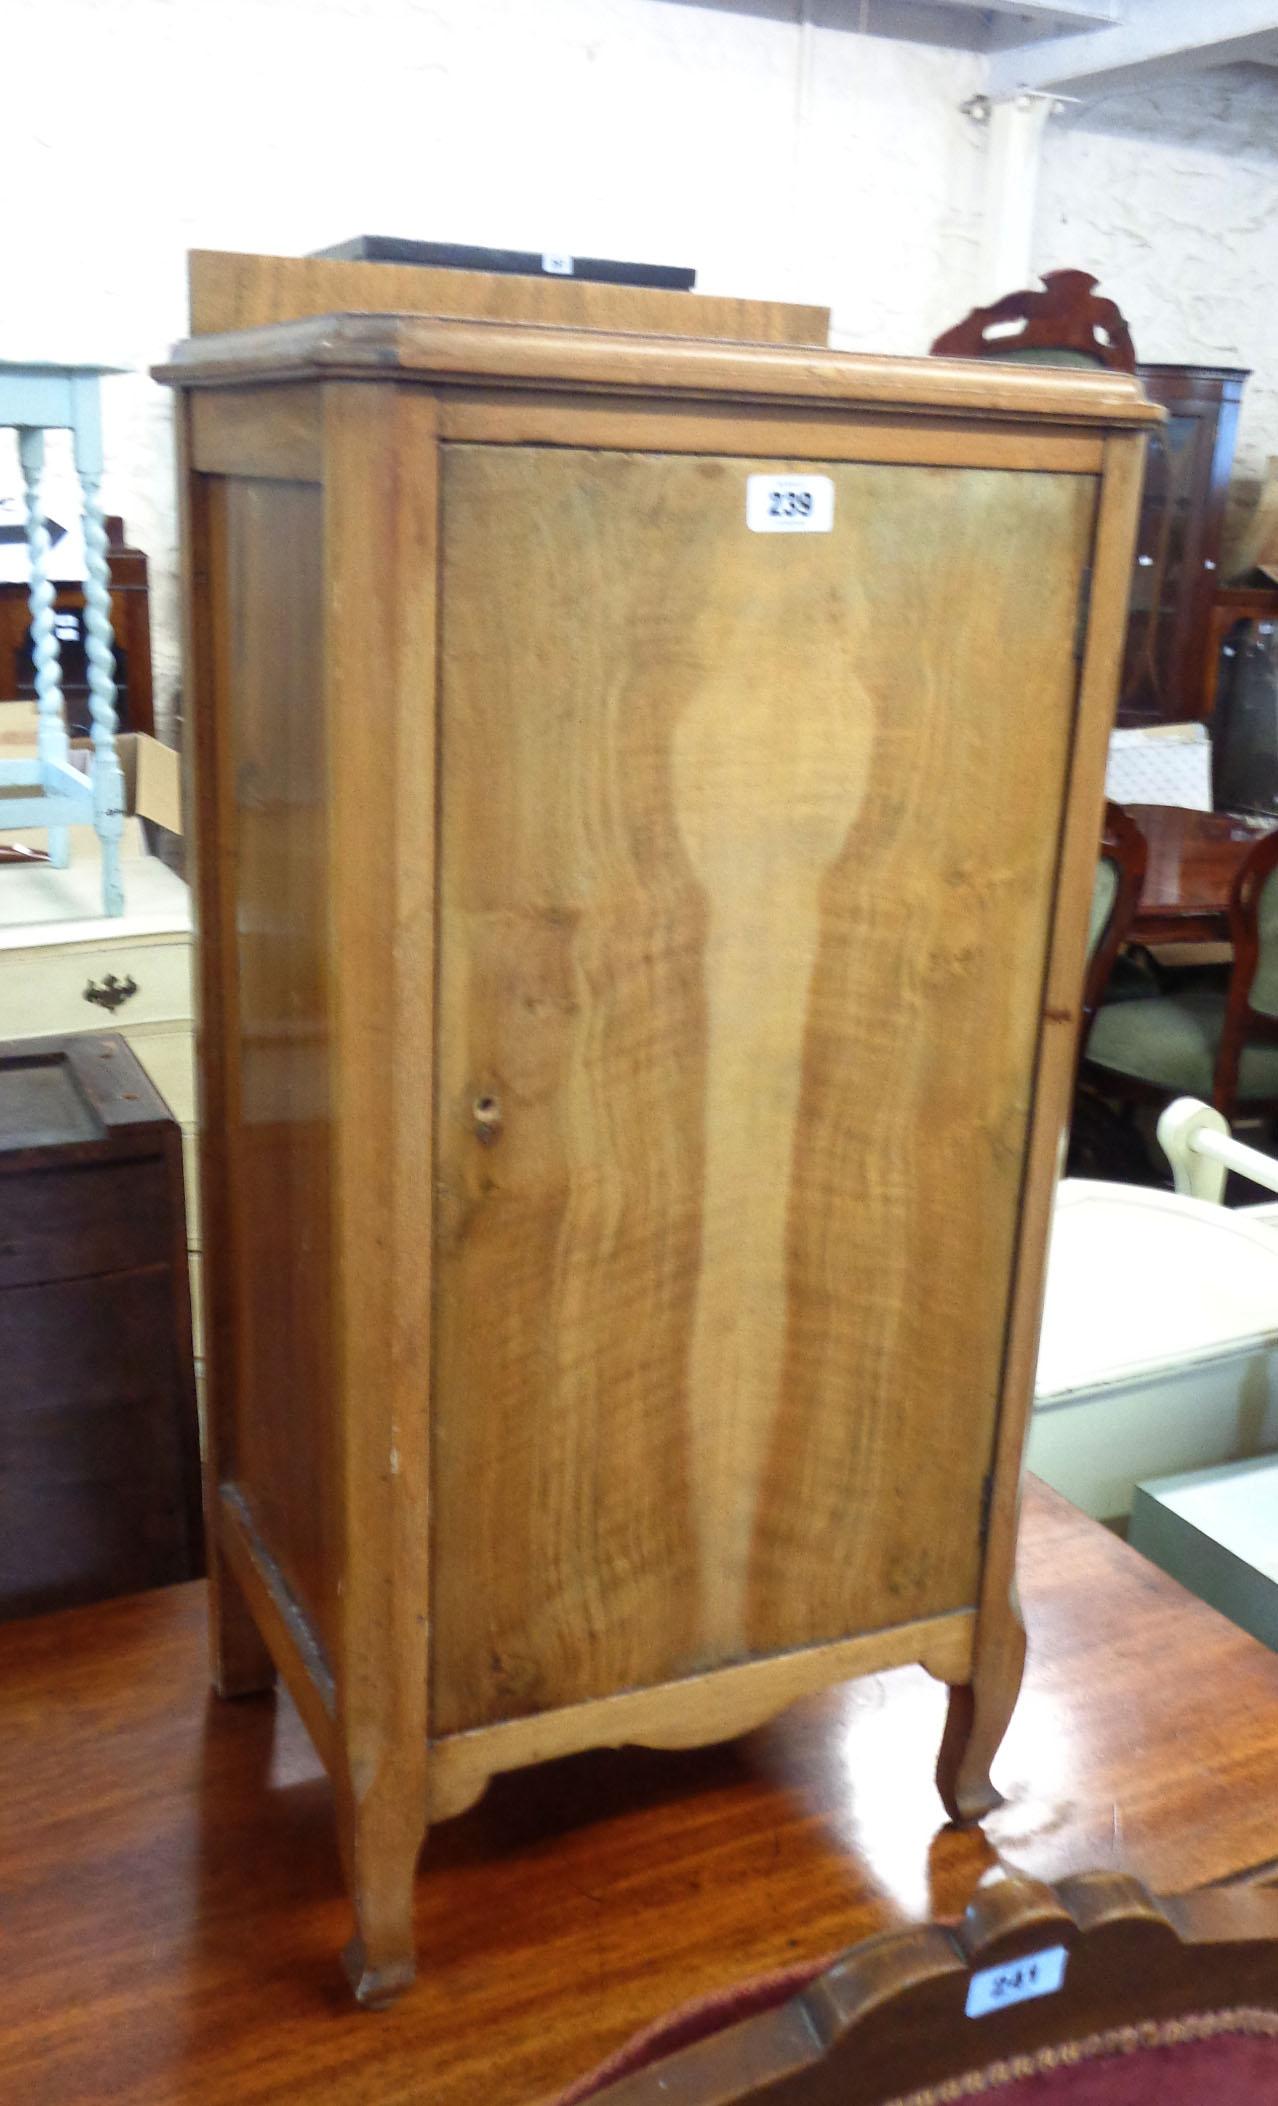 A 1930's walnut and mixed wood pot cupboard a/f